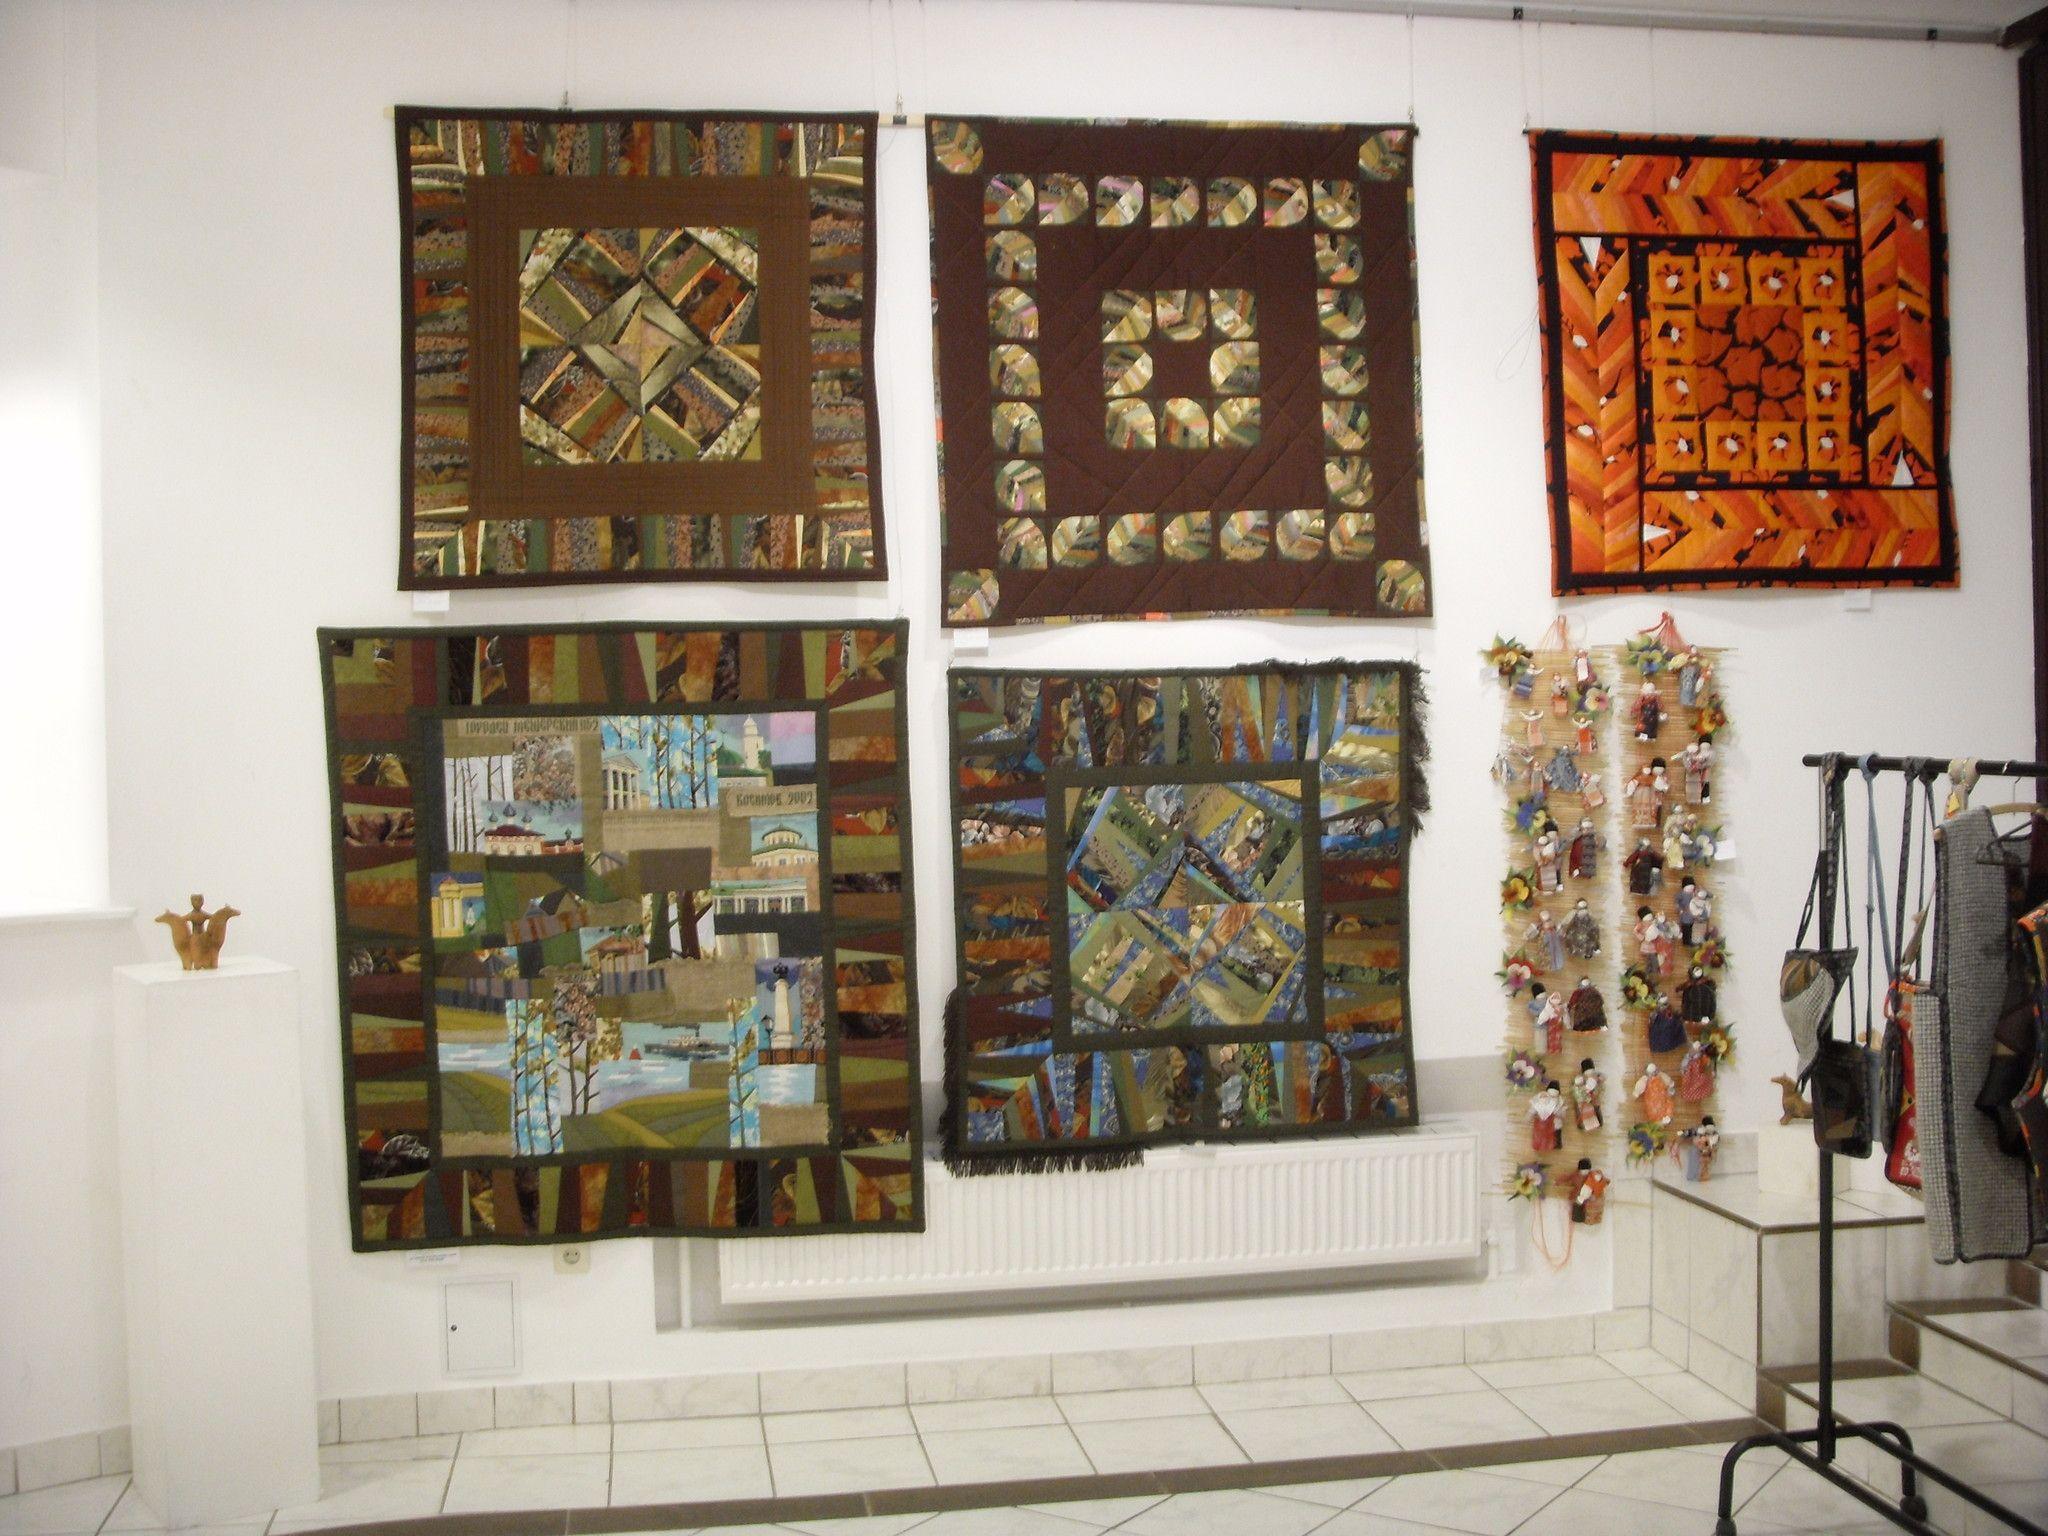 моя Вена 2009 год выставка - 38 фото. Фотографии Ирина Лебедева.